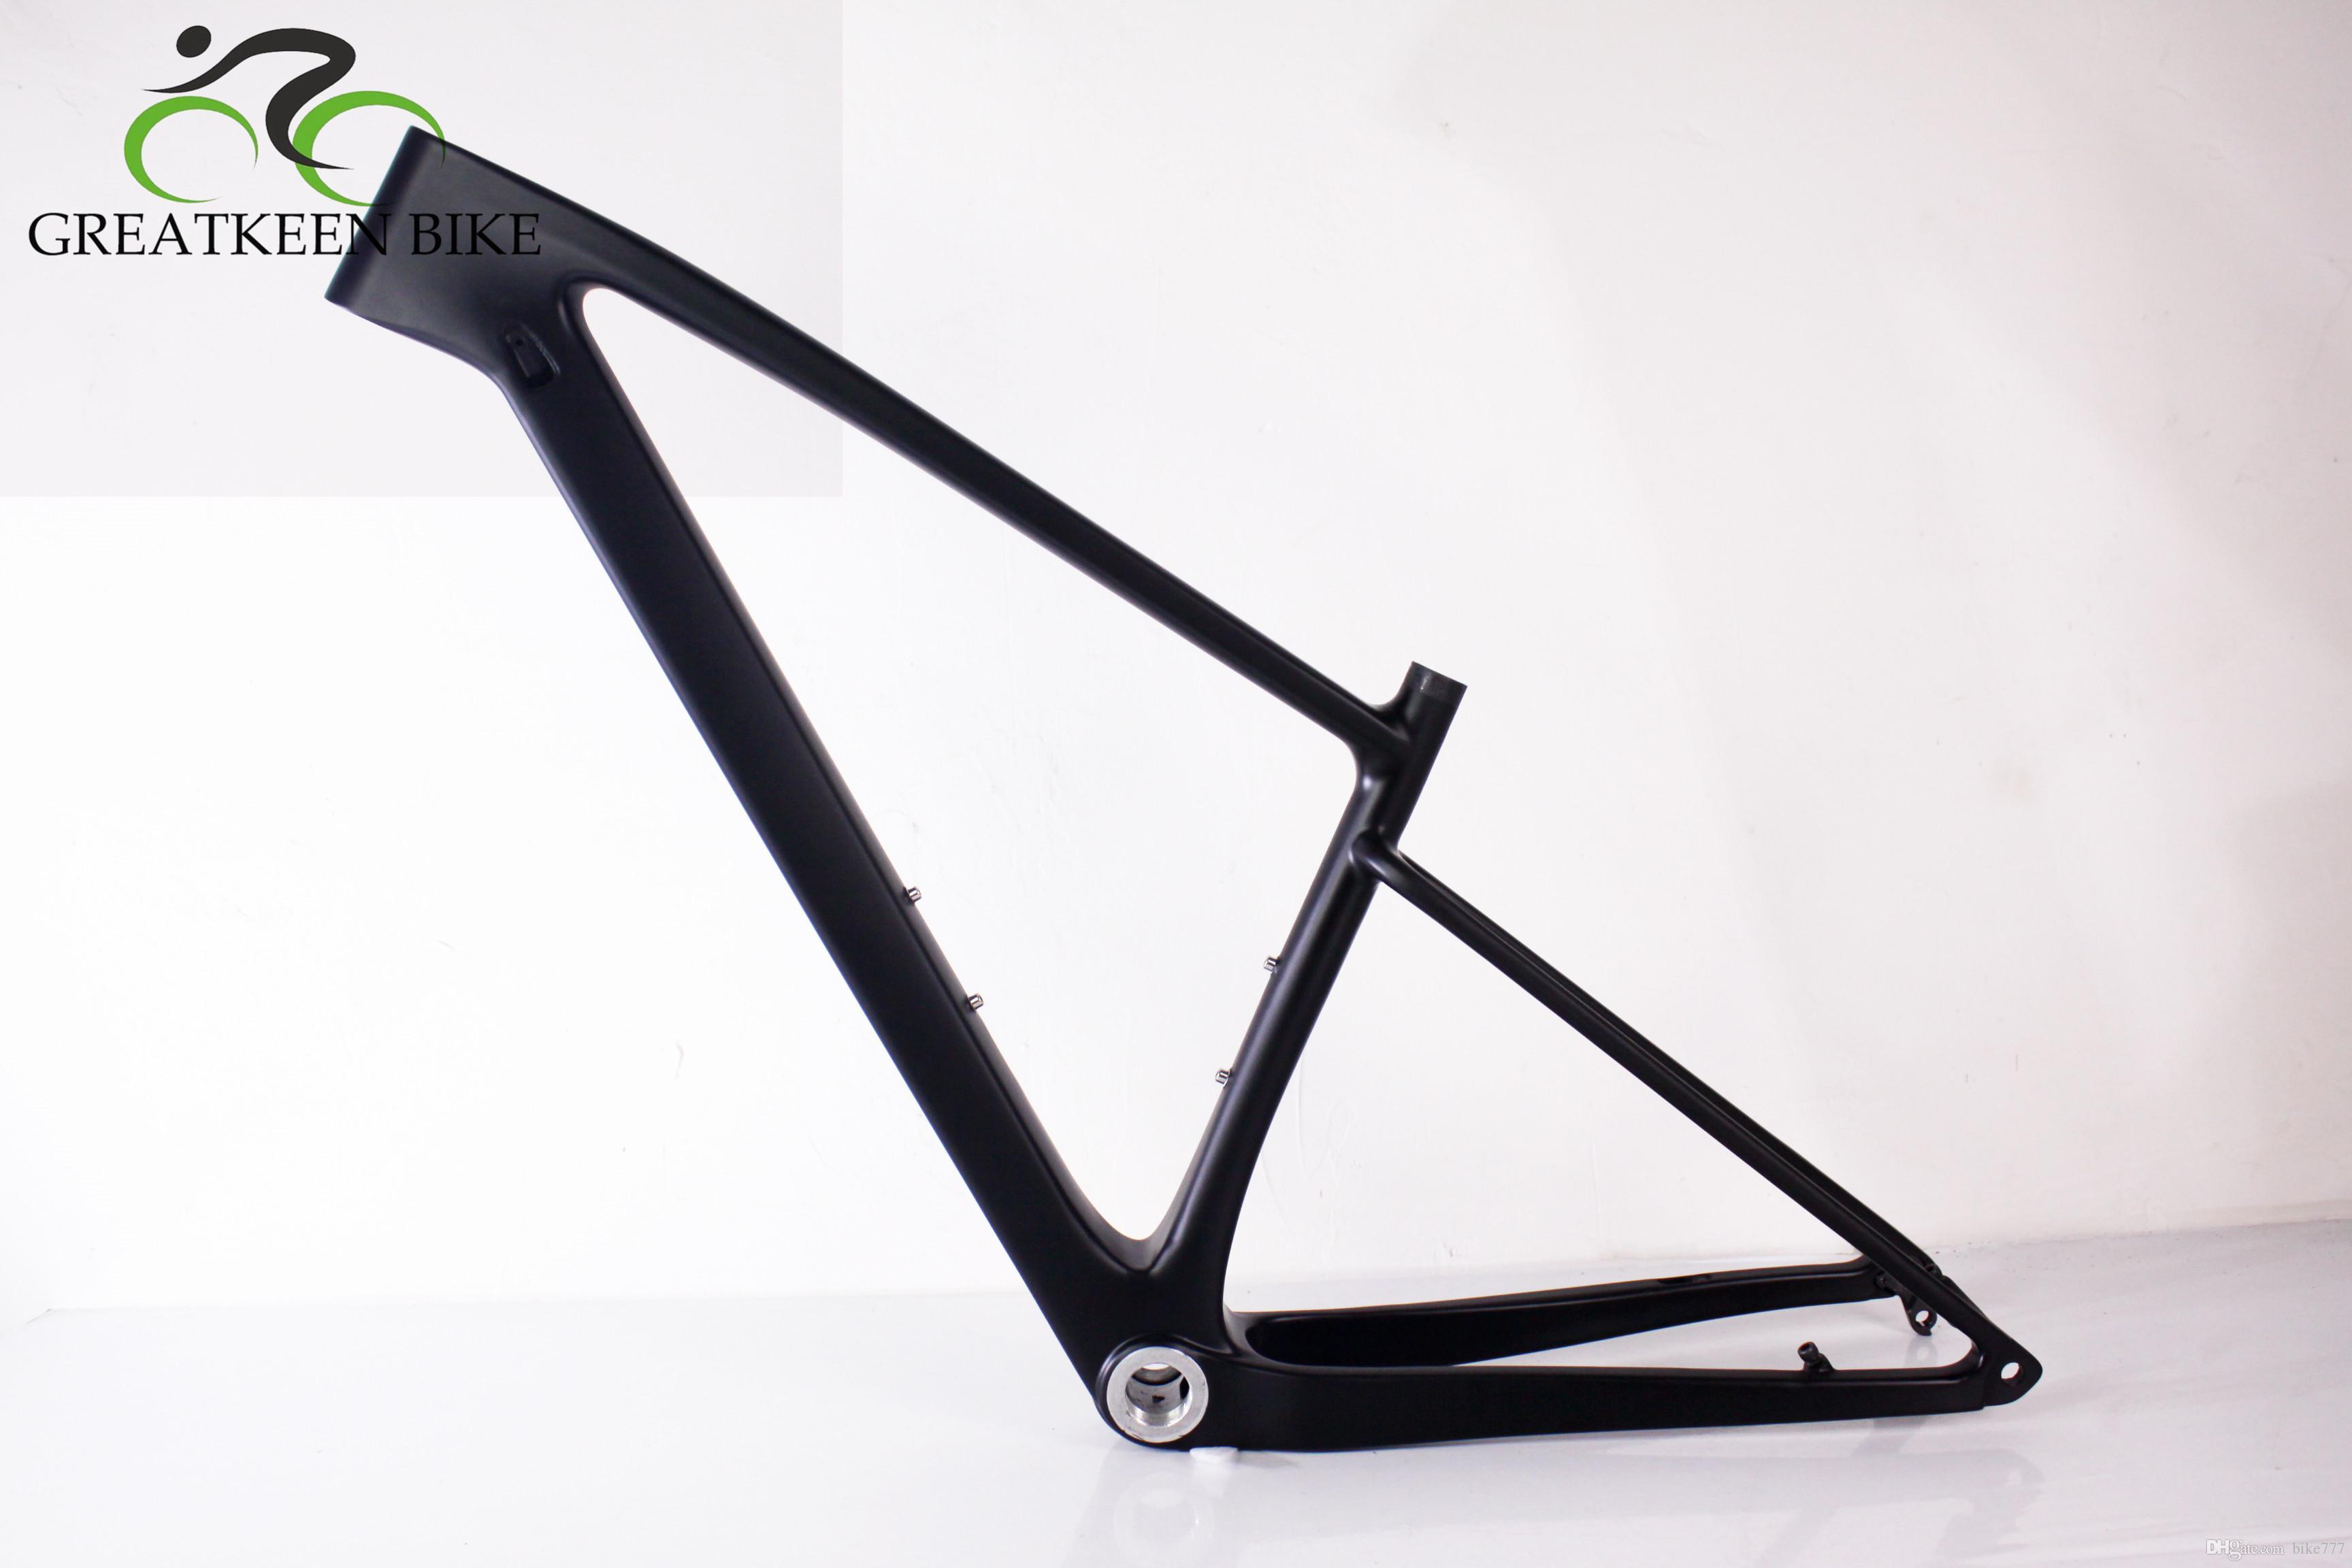 Carbon Fiber Bike Frame >> 2019 Hot Sale Greateenbike Mtb05 T1000 Ud 29er Carbon Mountain Bike